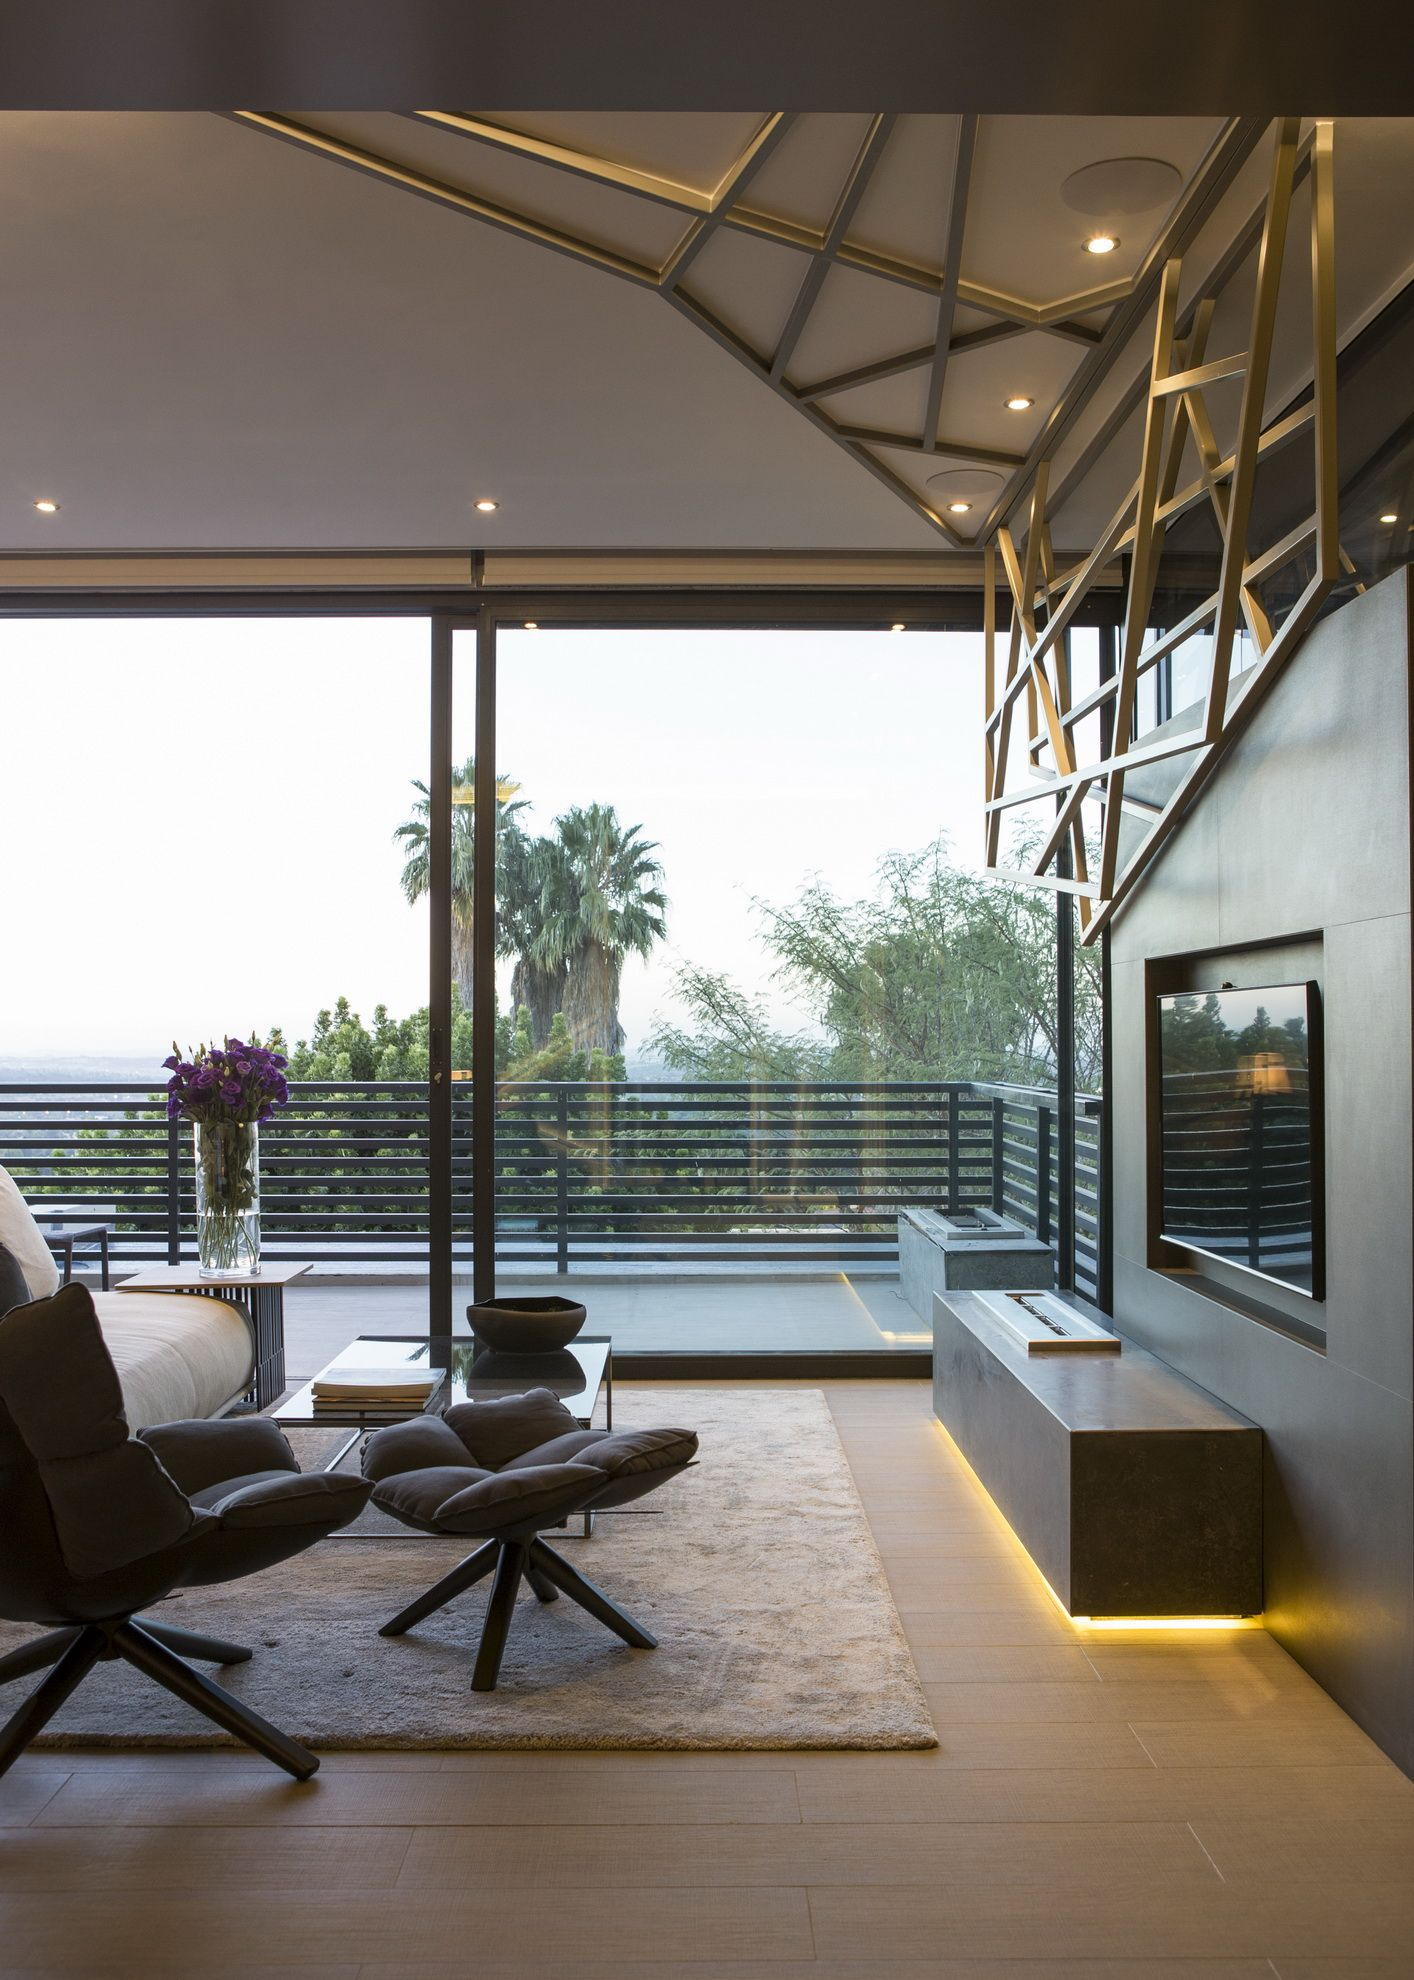 Concrete house main bedroom m square lifestyle design m square lifestyle necessities design furniture interior